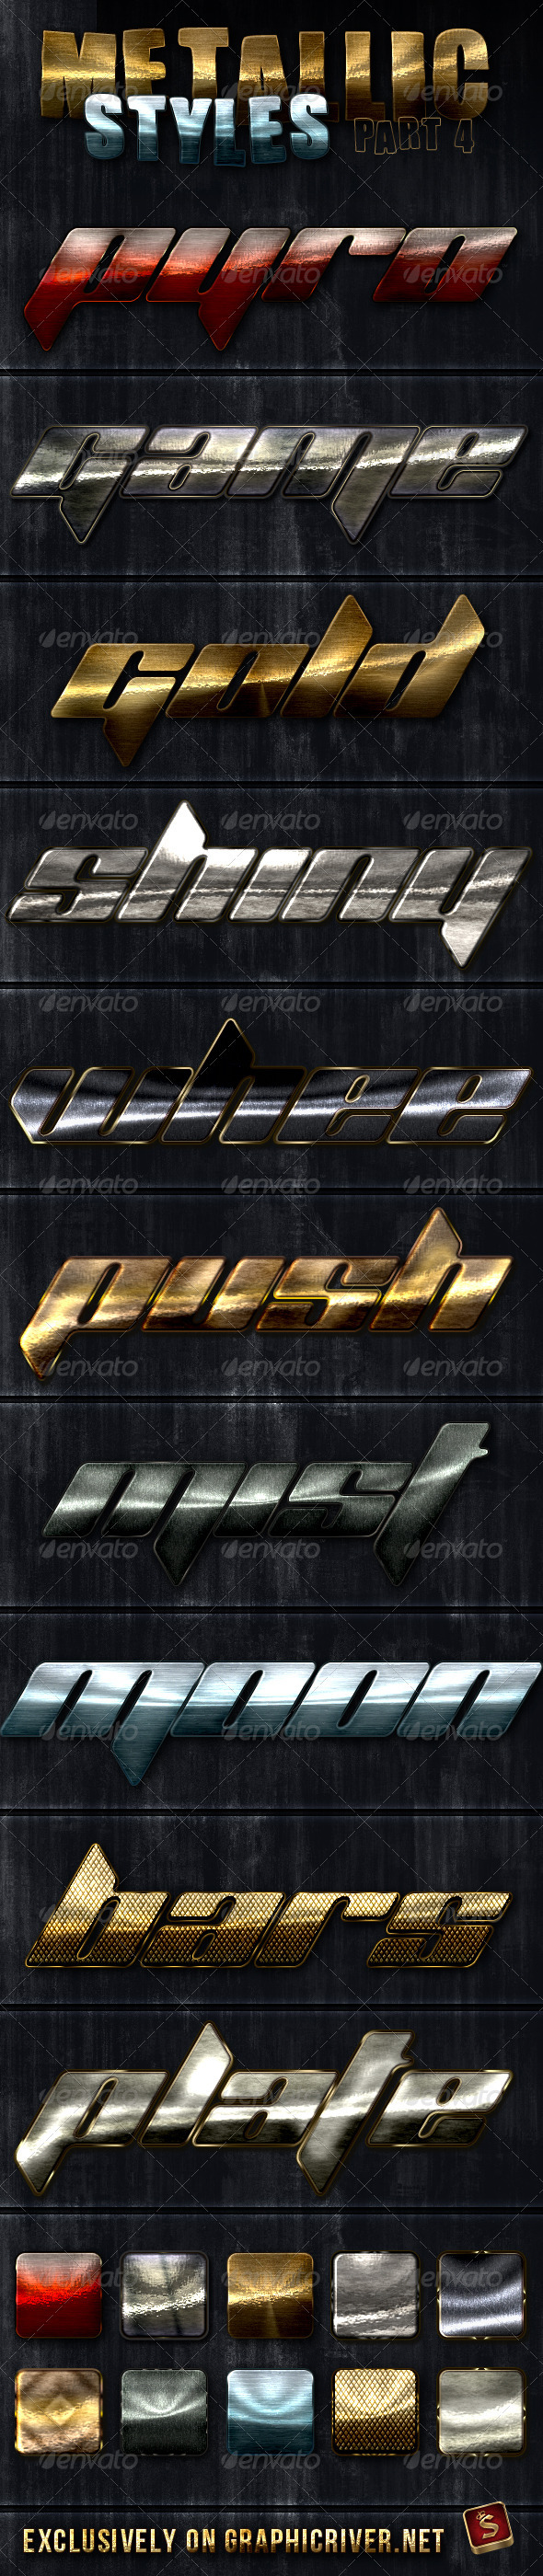 GraphicRiver Unique Metallic Styles Part 4 2938472